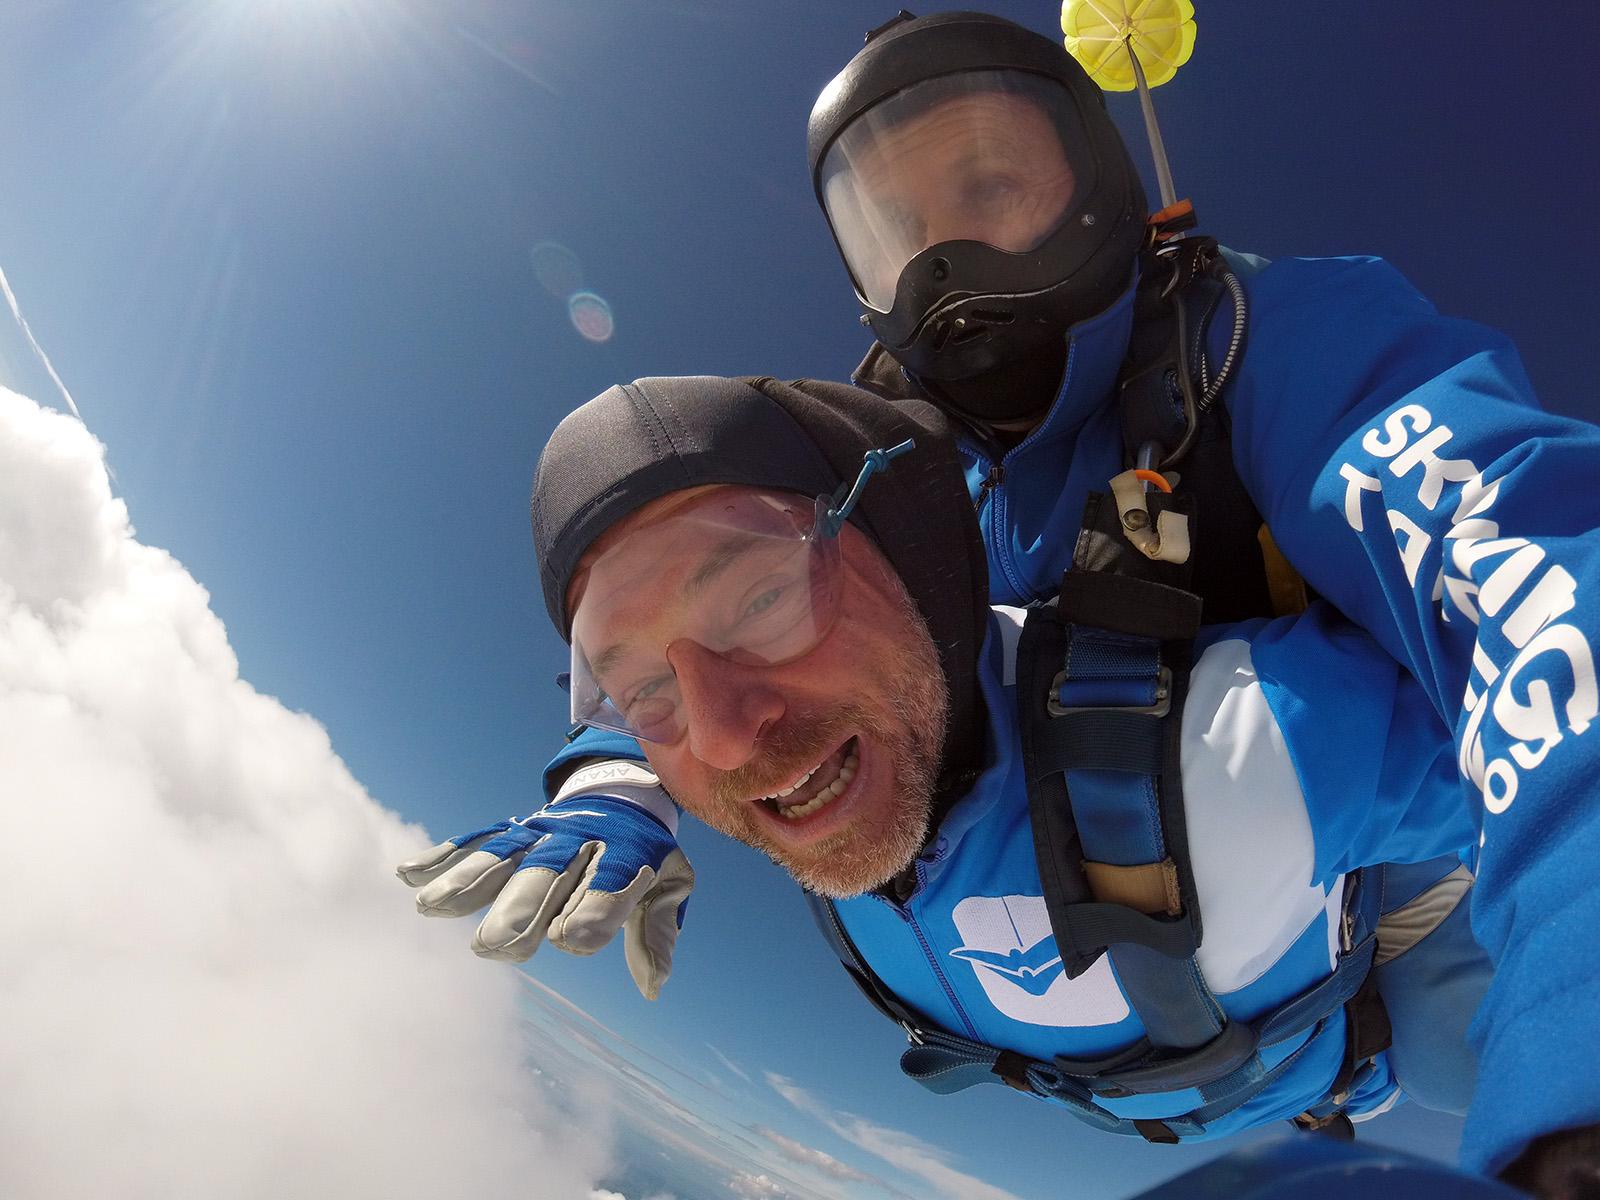 Rene Biotorajac skok ioz aviona sa ekipom AK Tandem